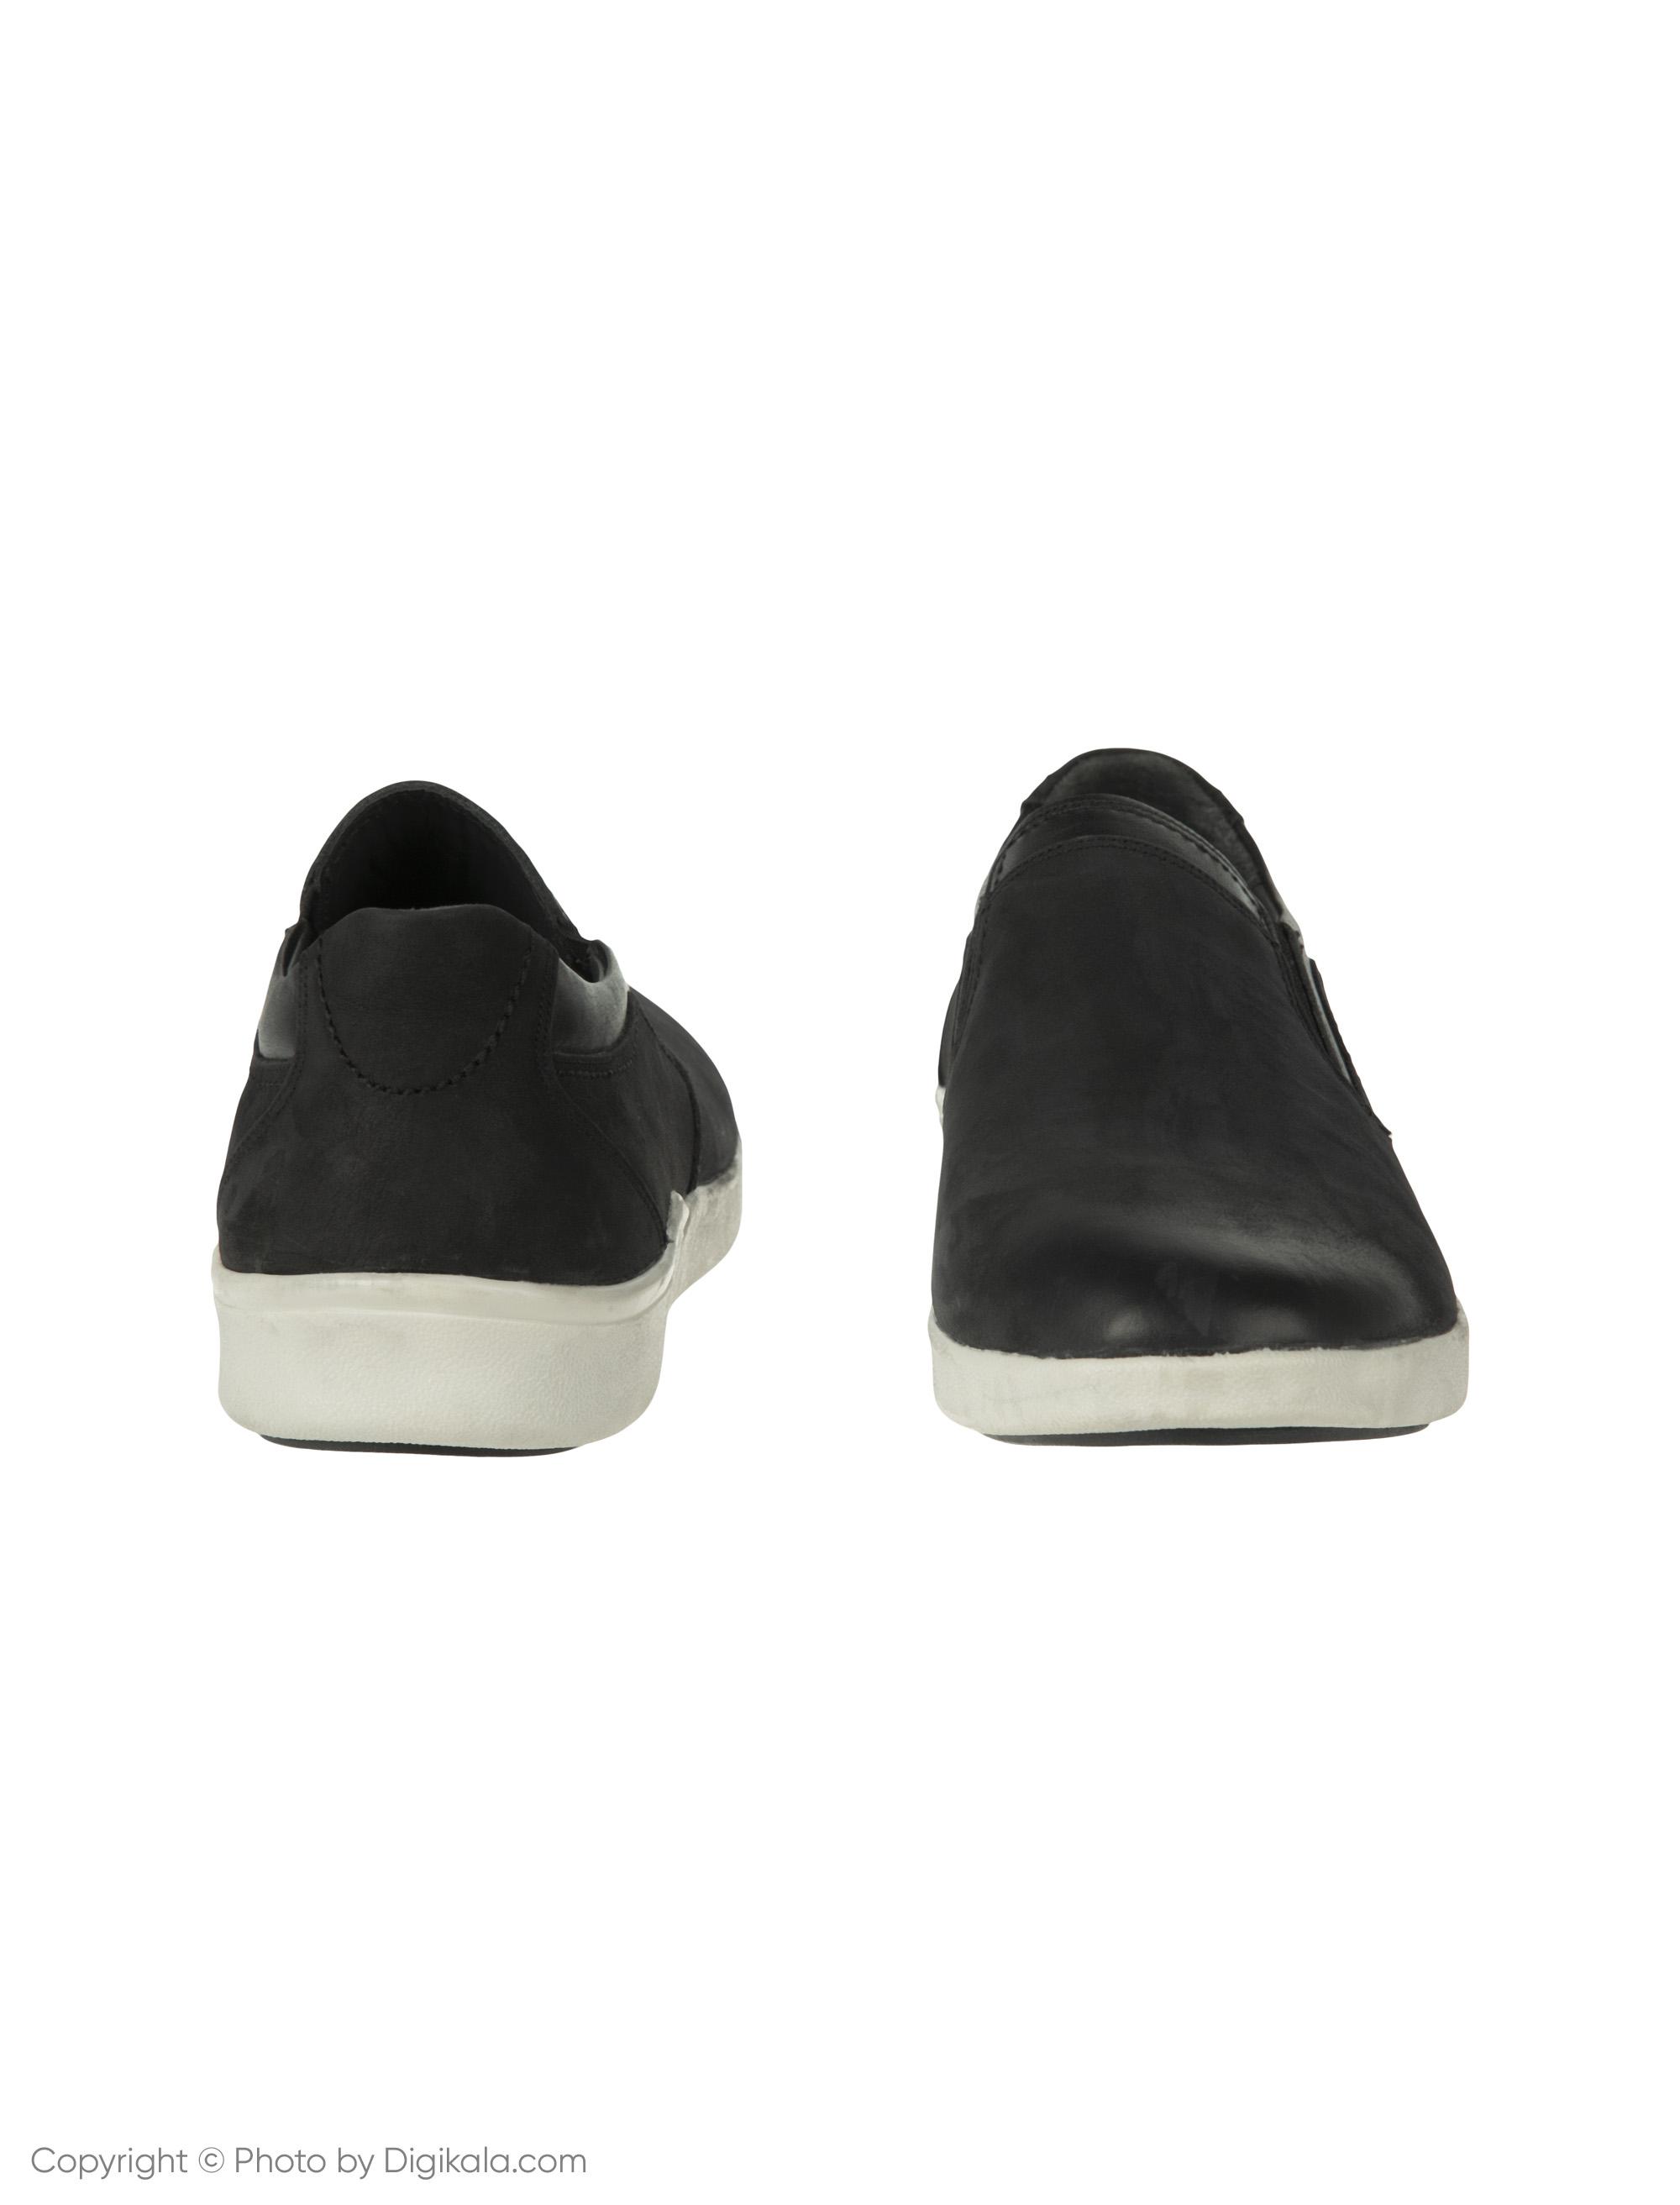 کفش روزمره مردانه ساتین مدل SN7178A-101 -  - 4